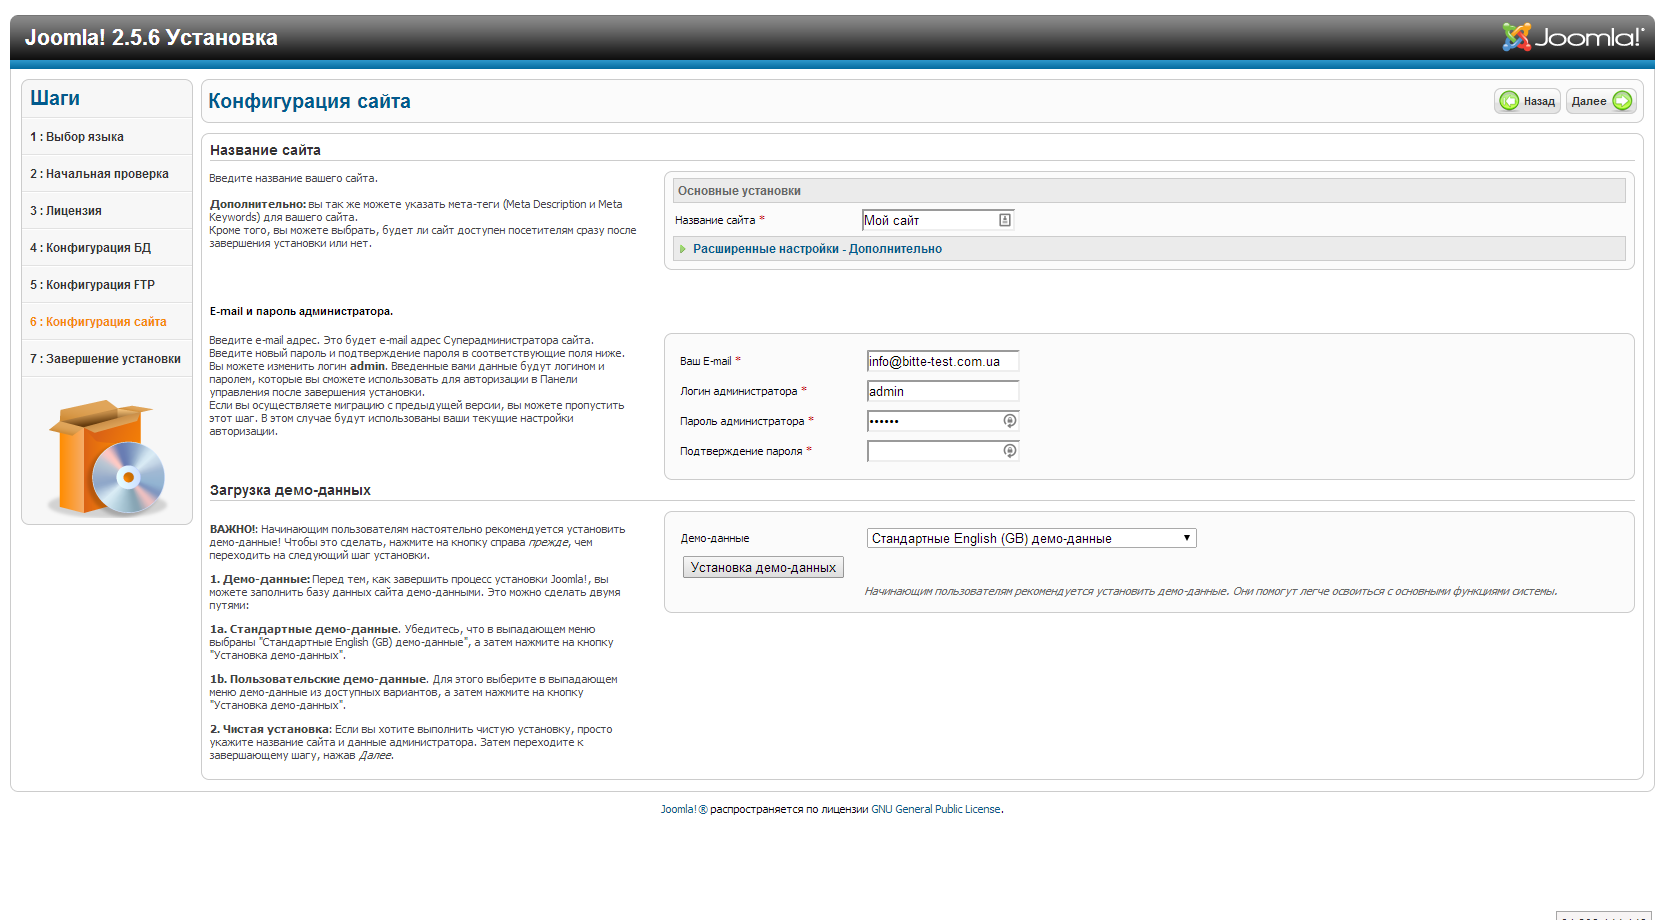 Конфигурация сайта - Joomla